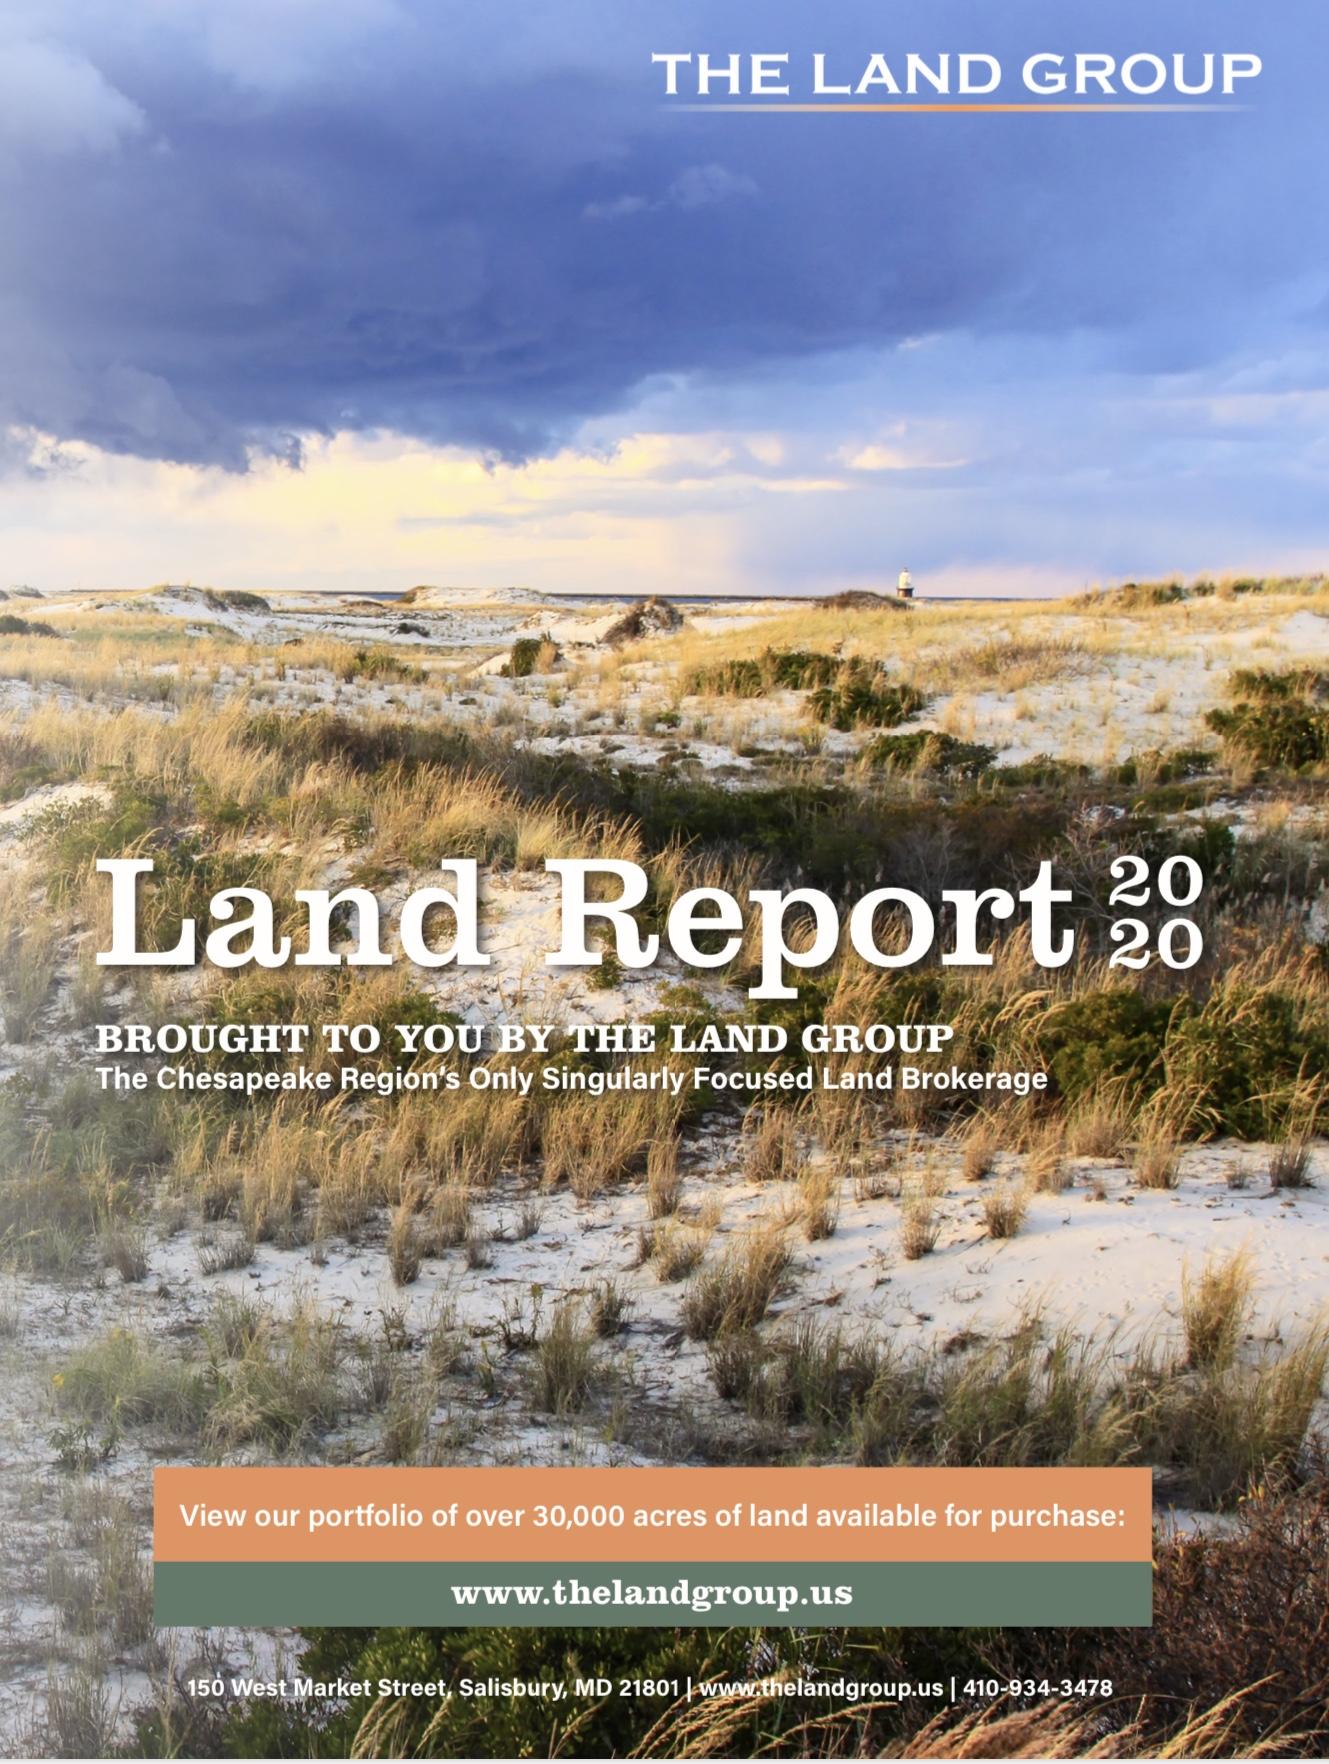 Land Report 2020